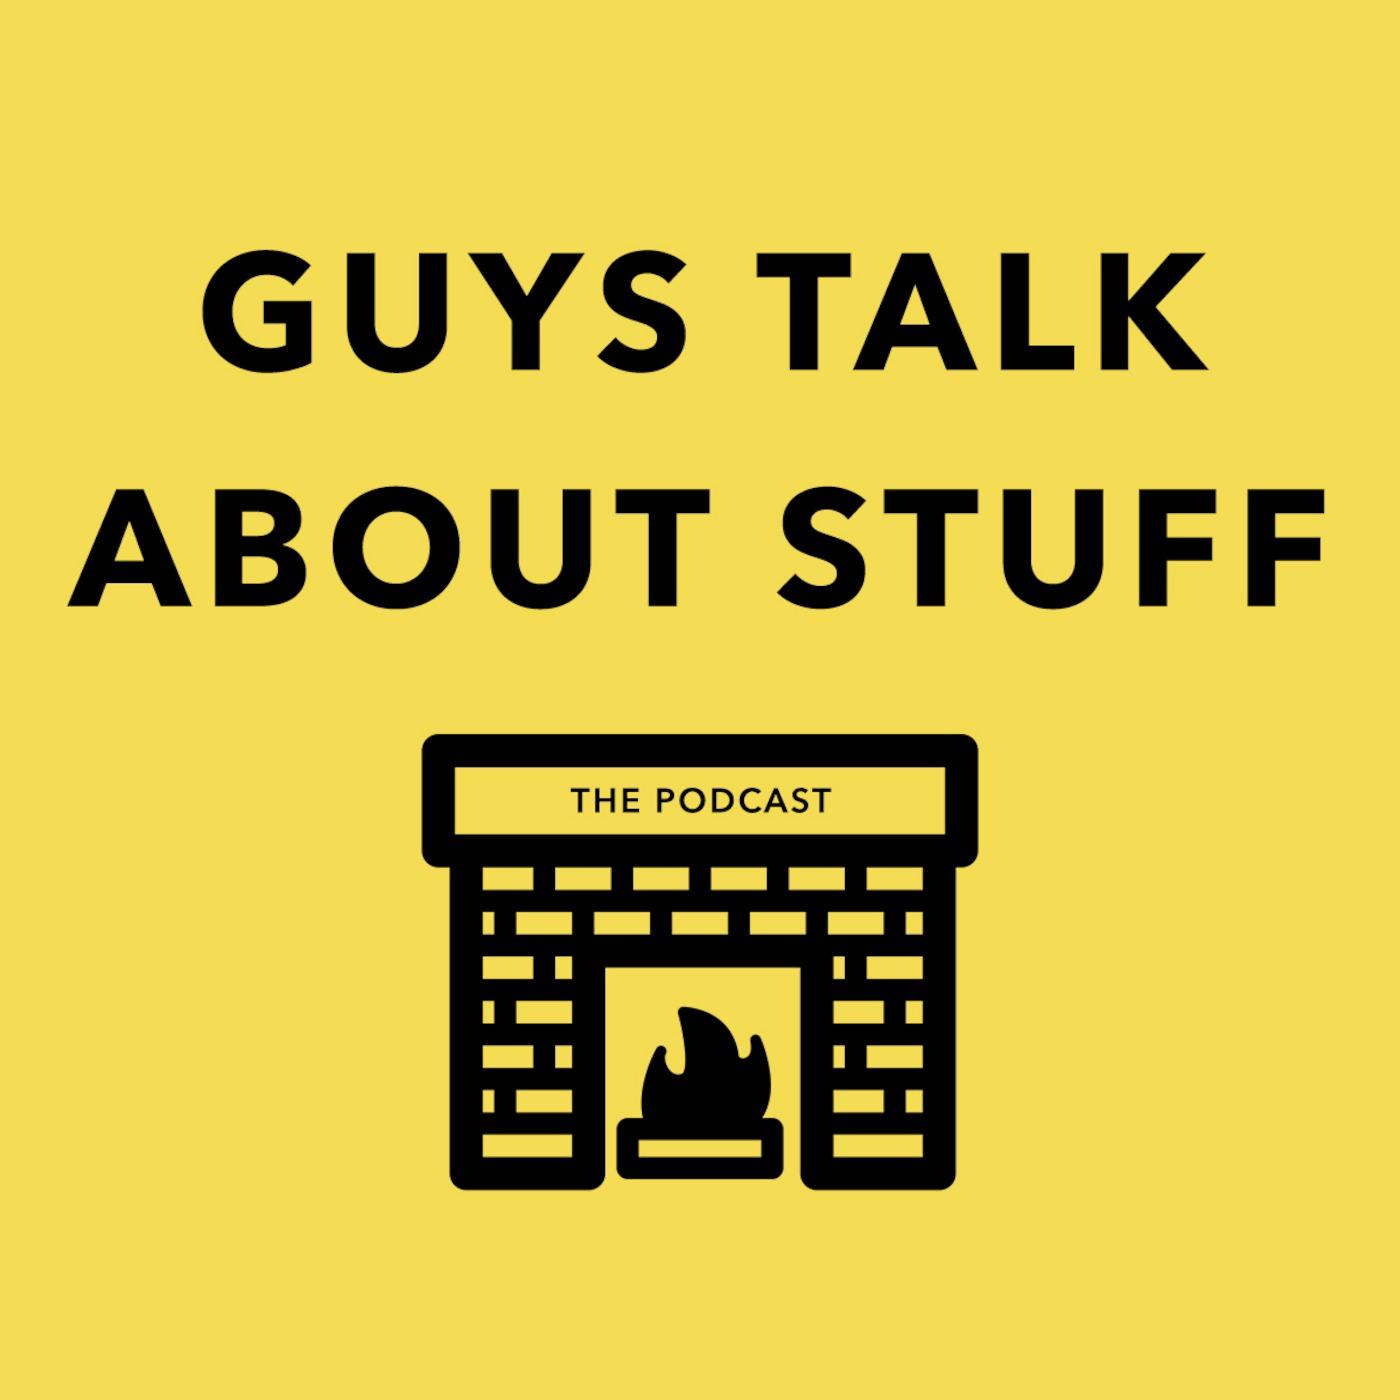 Guys Talk About Stuff